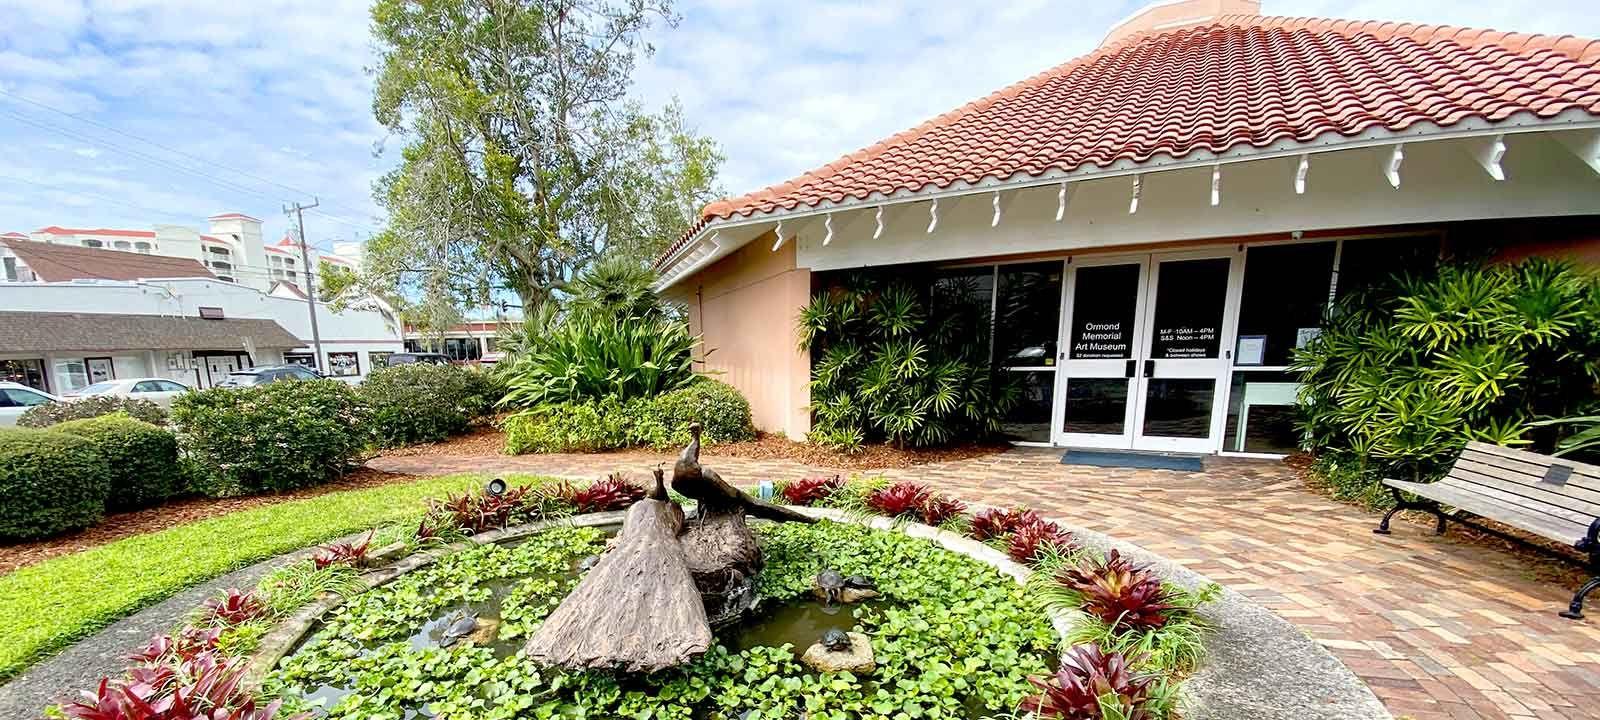 Museum Closed For Now: Enjoy the Gardens